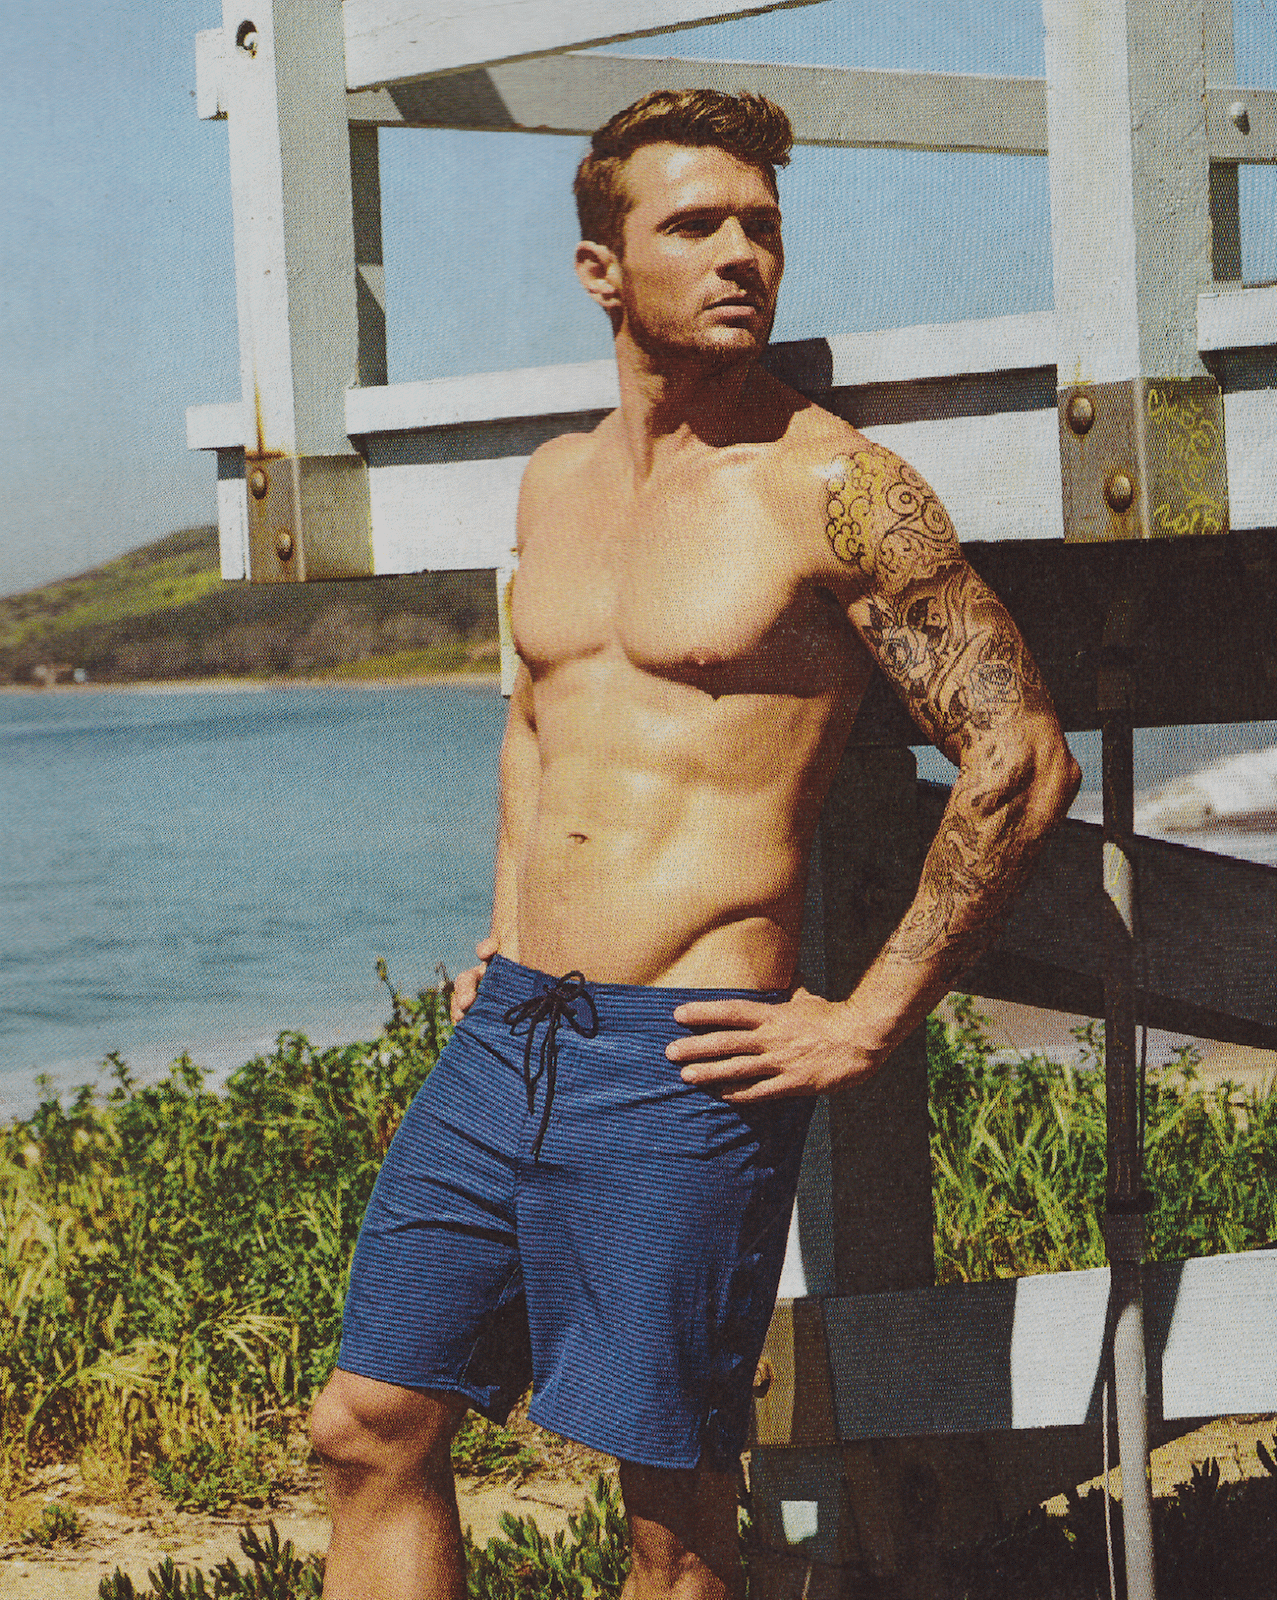 Ryan Phillippe naked shirtless pics (1)